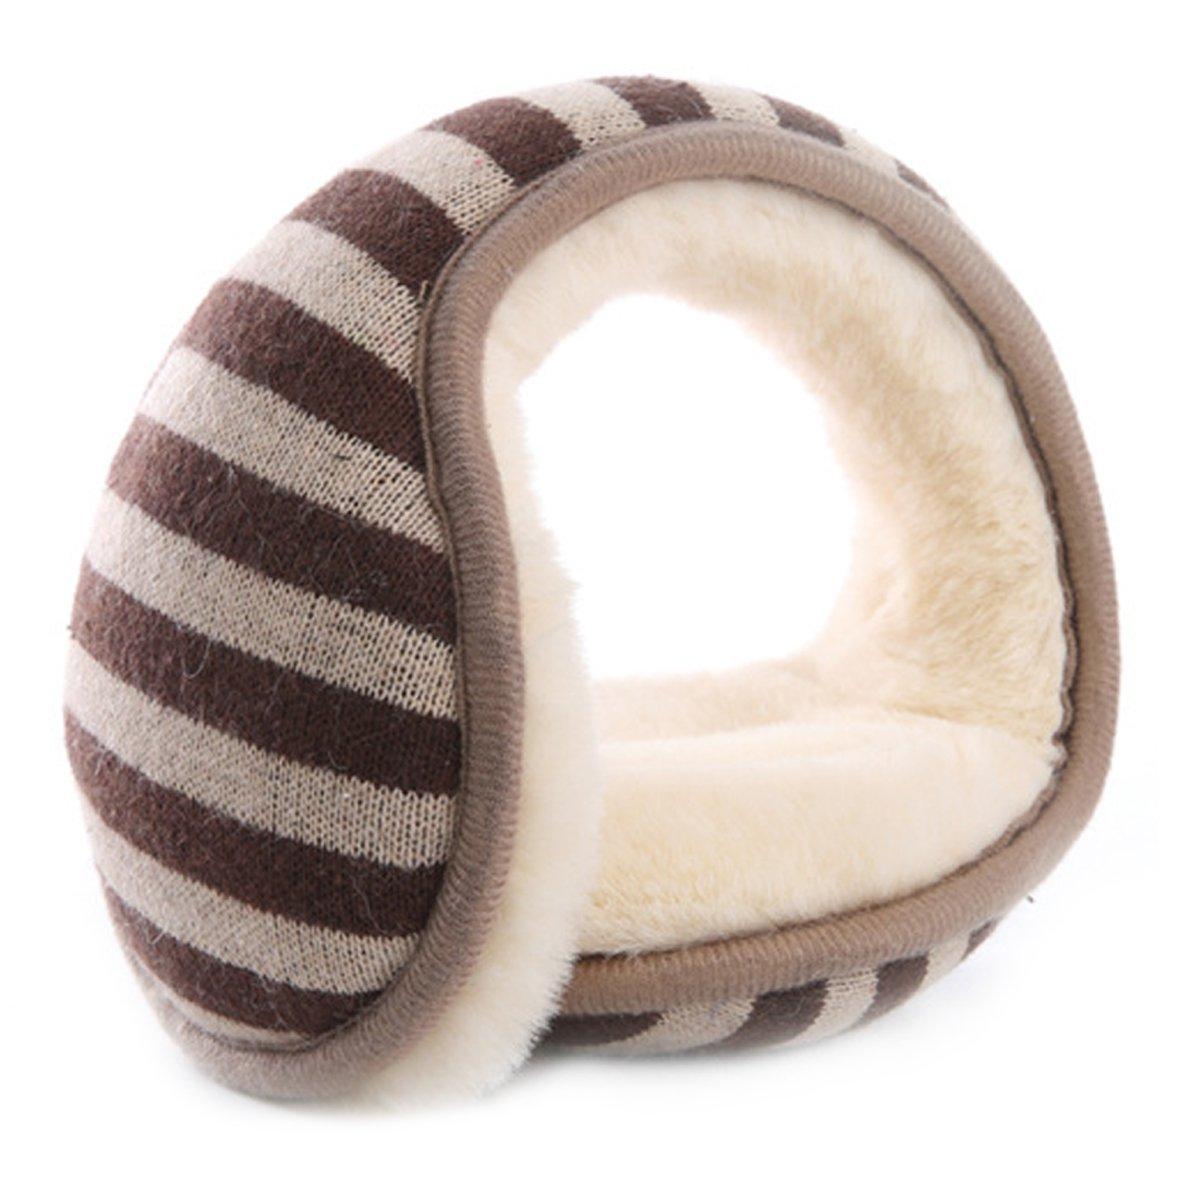 Surblue Classic Warm Kint Foldable Stripe Earmuffs with Fur Earwarmer Winter Outdoor Earmuffs, Adjustable Warp